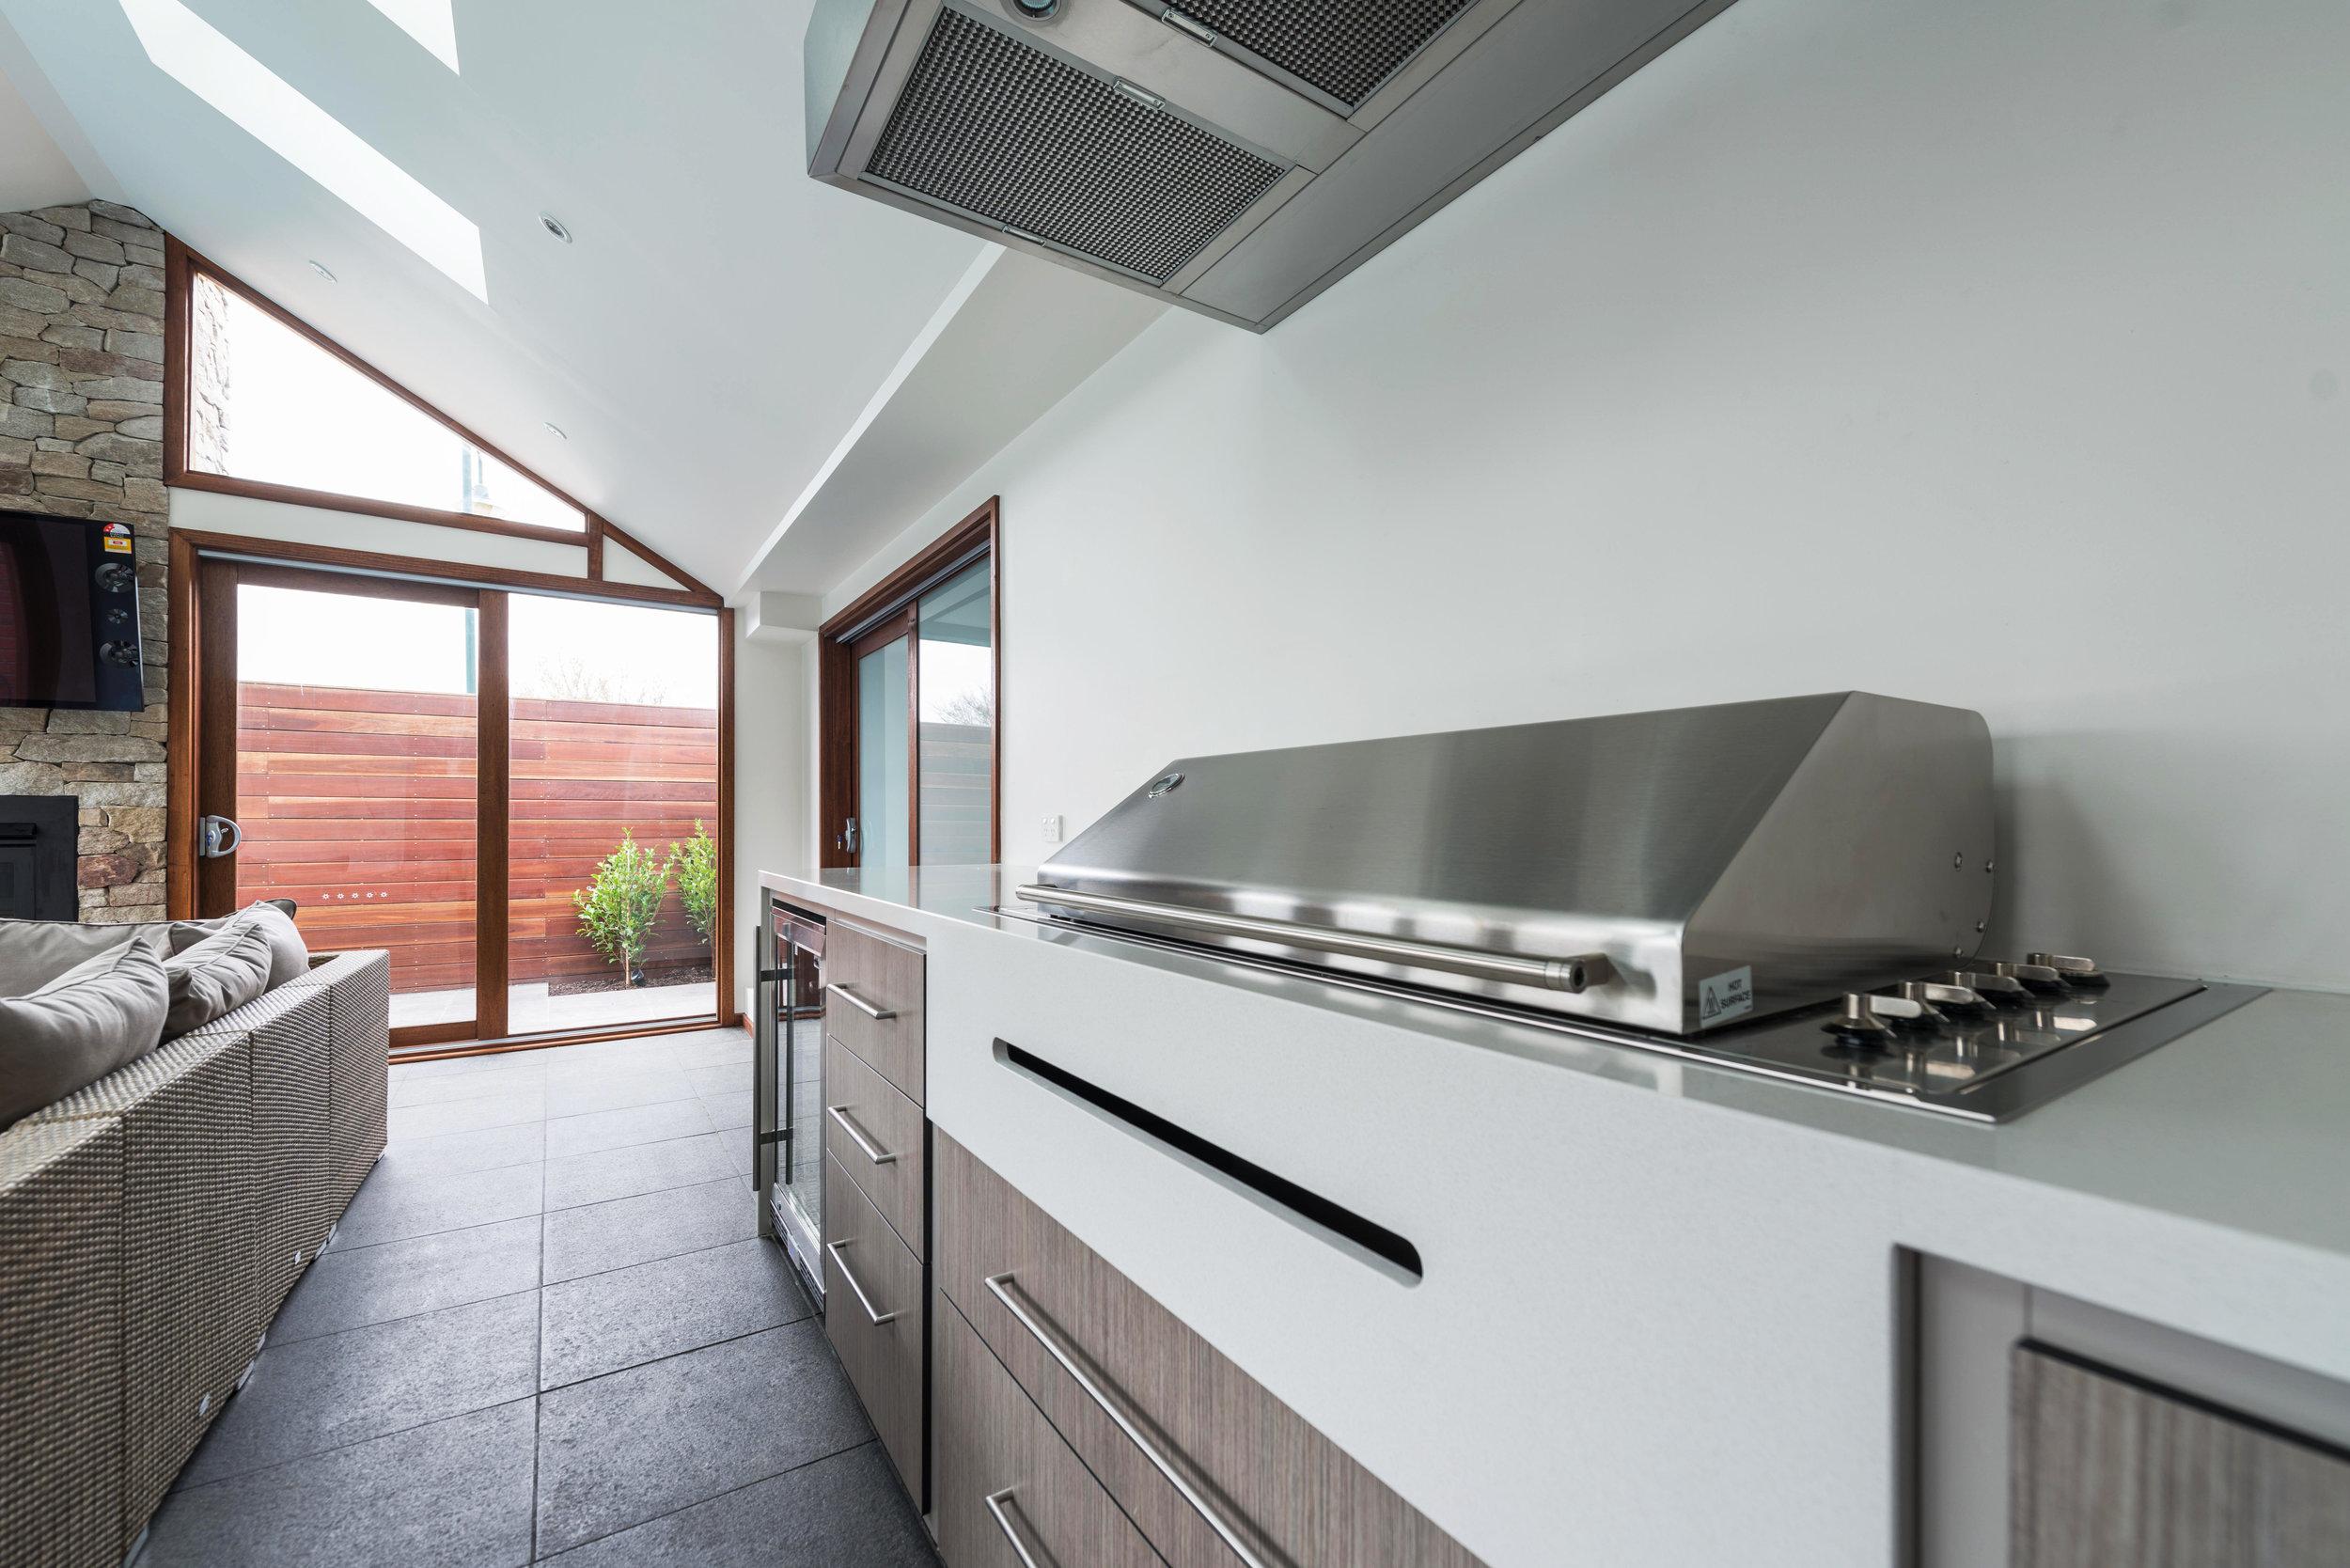 Aspendale outdoor kitchen edited.jpg